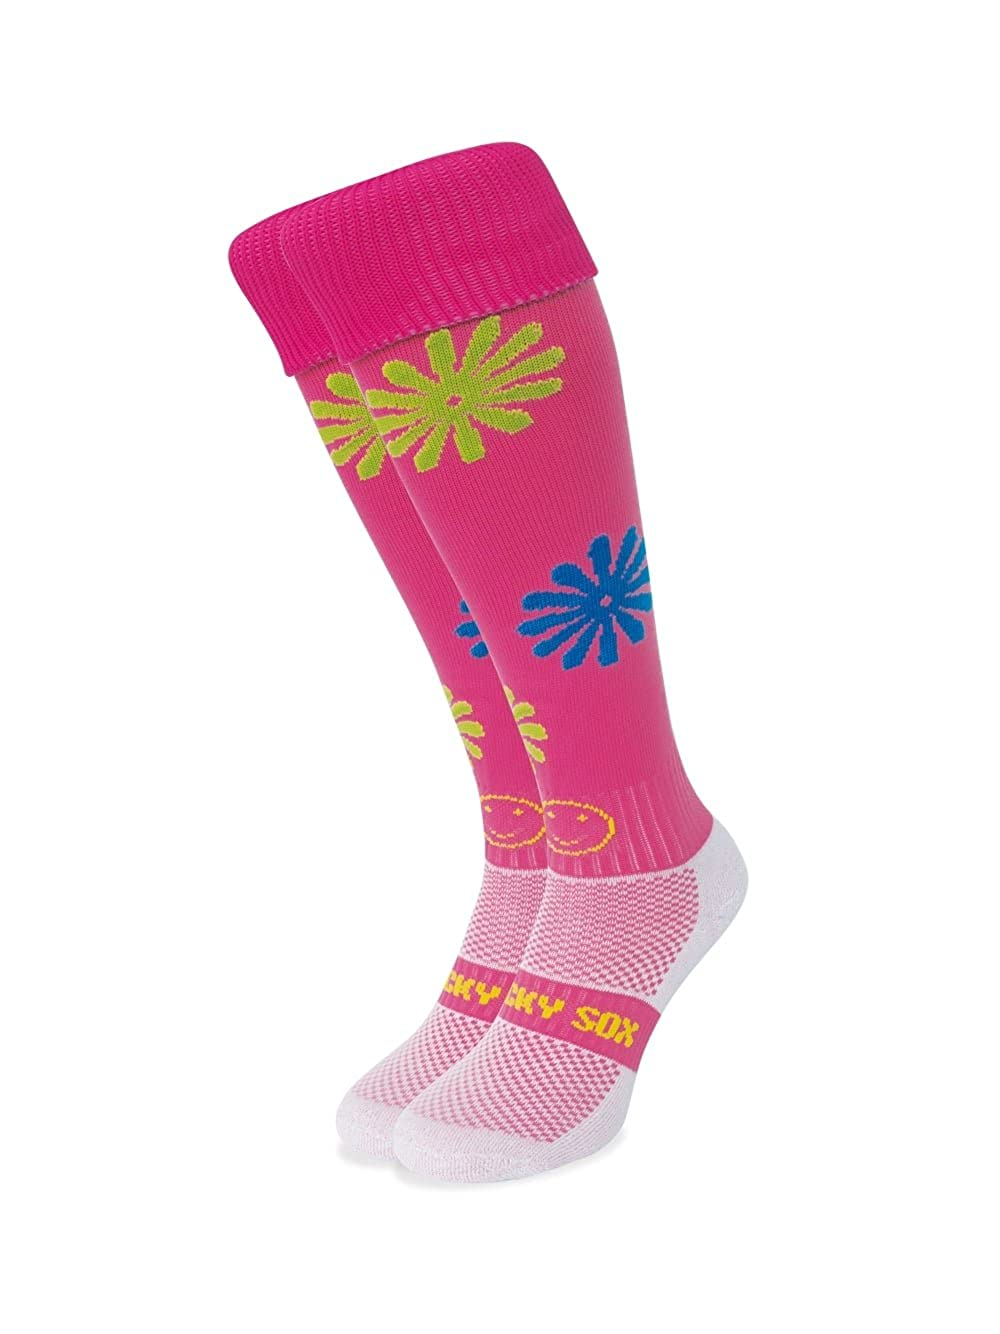 WackySox Saver Bundle Half Price Sugar and Spice Sports Socks